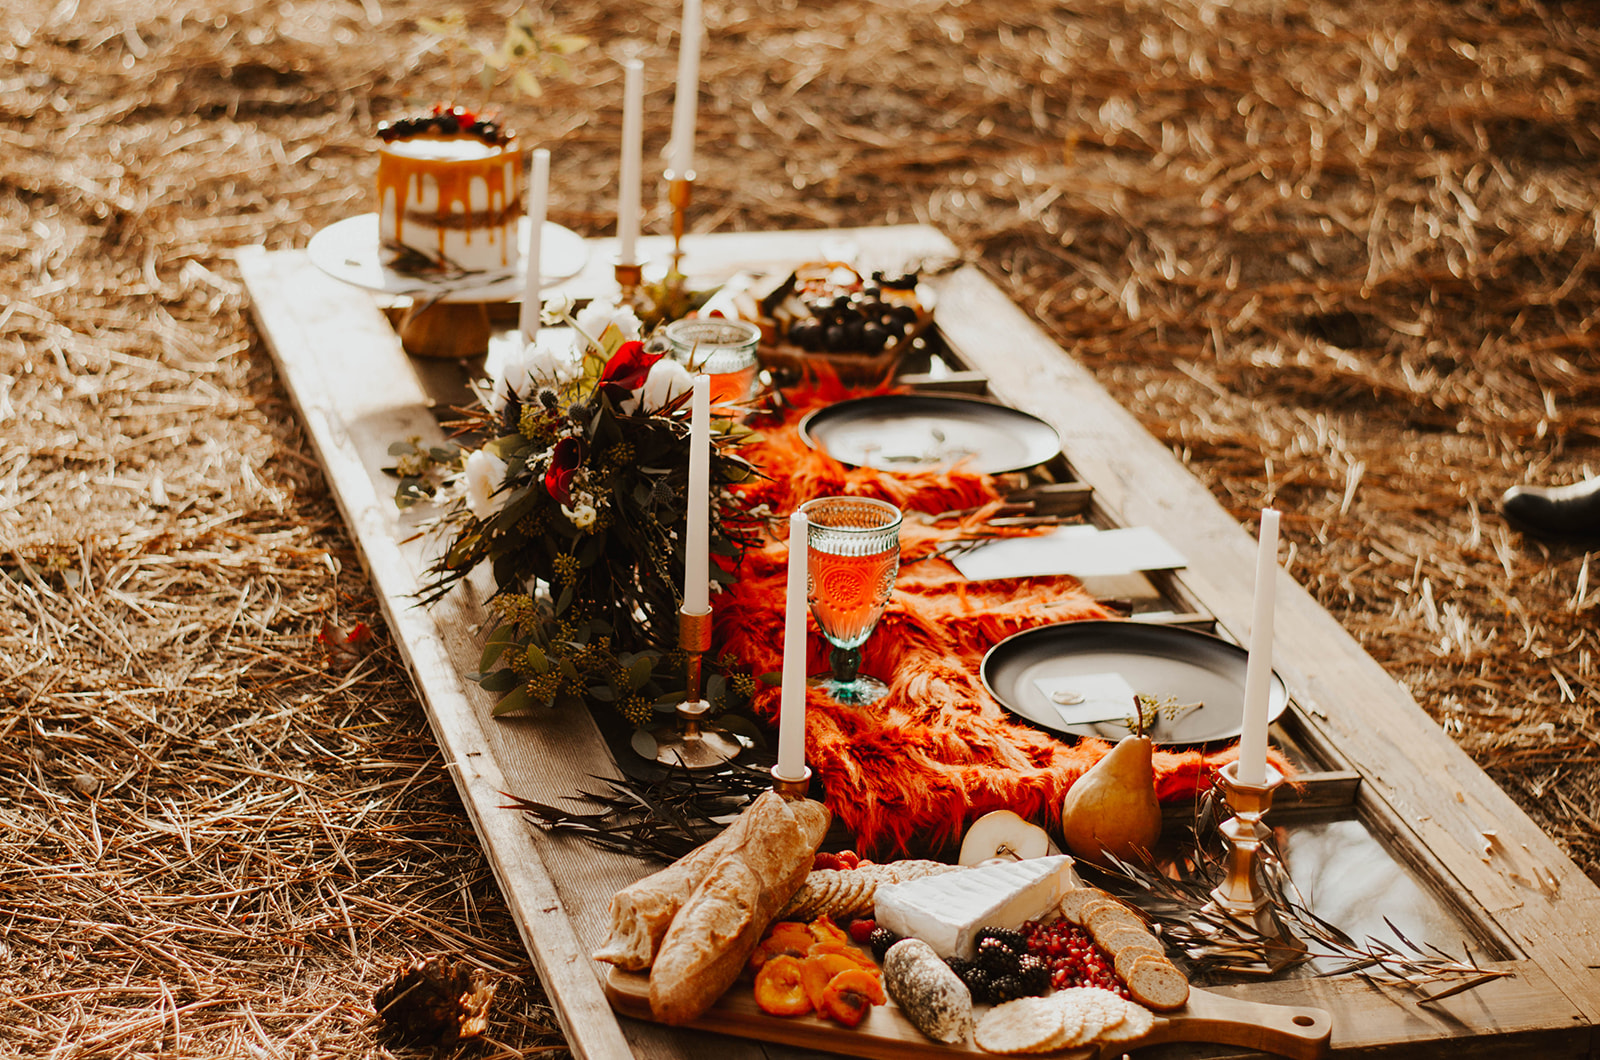 spokane wedding elopement plated meal image